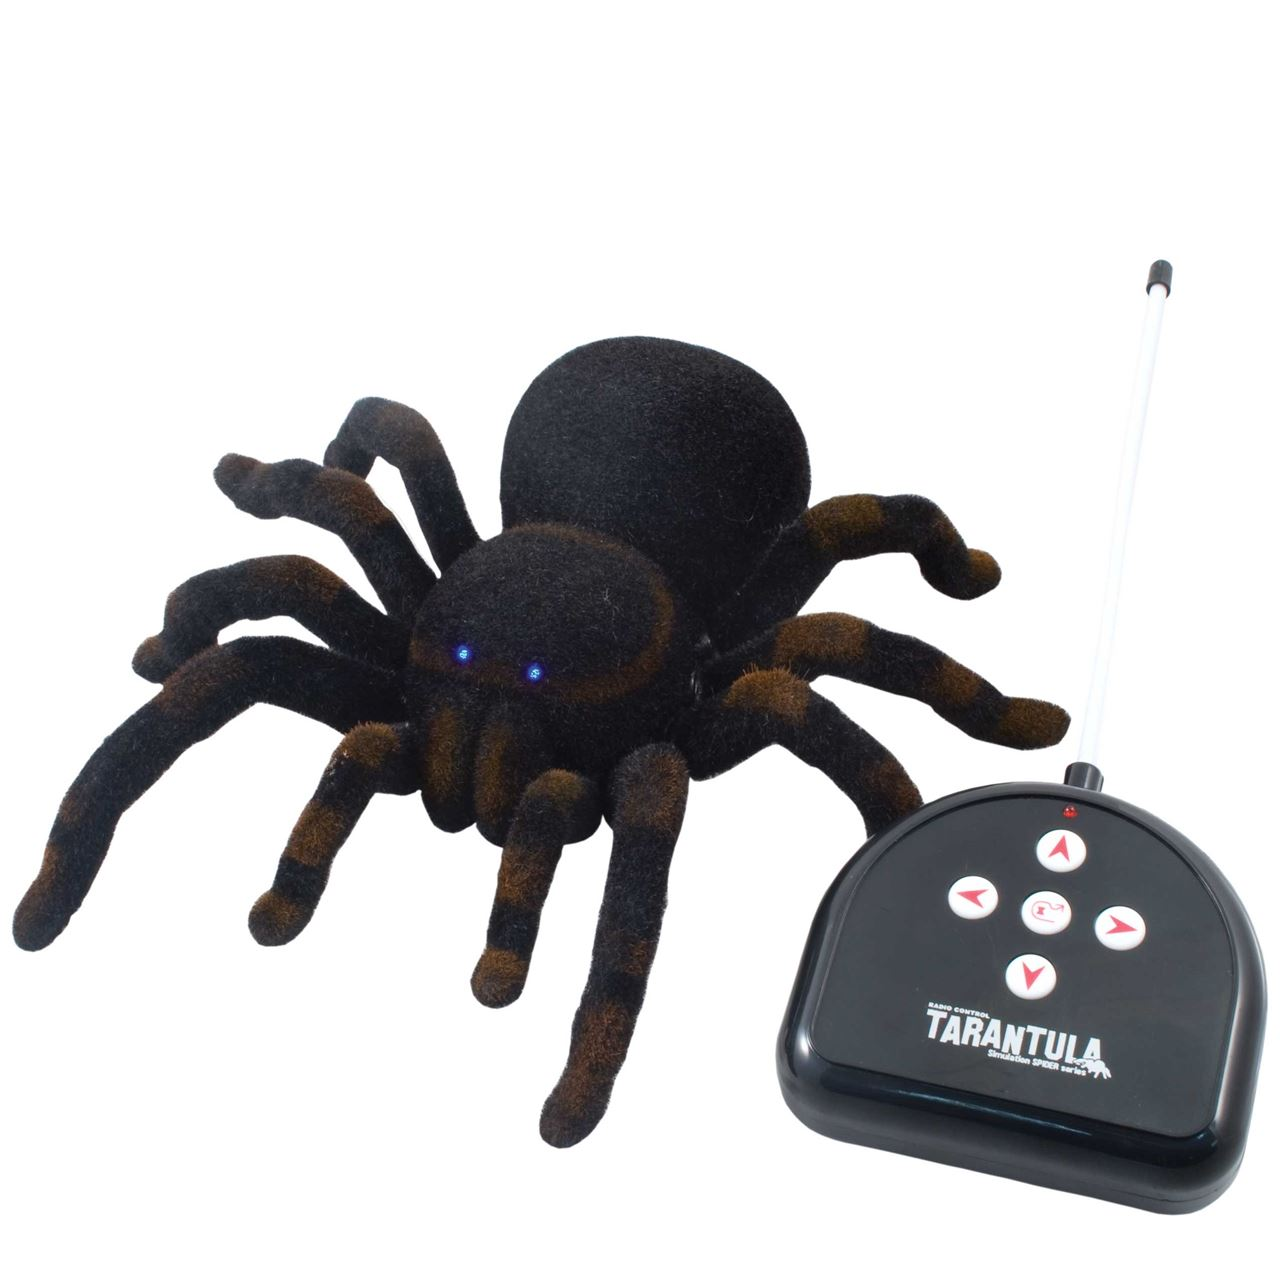 Remote Control Giant Tarantula Tech Toys Gadgets